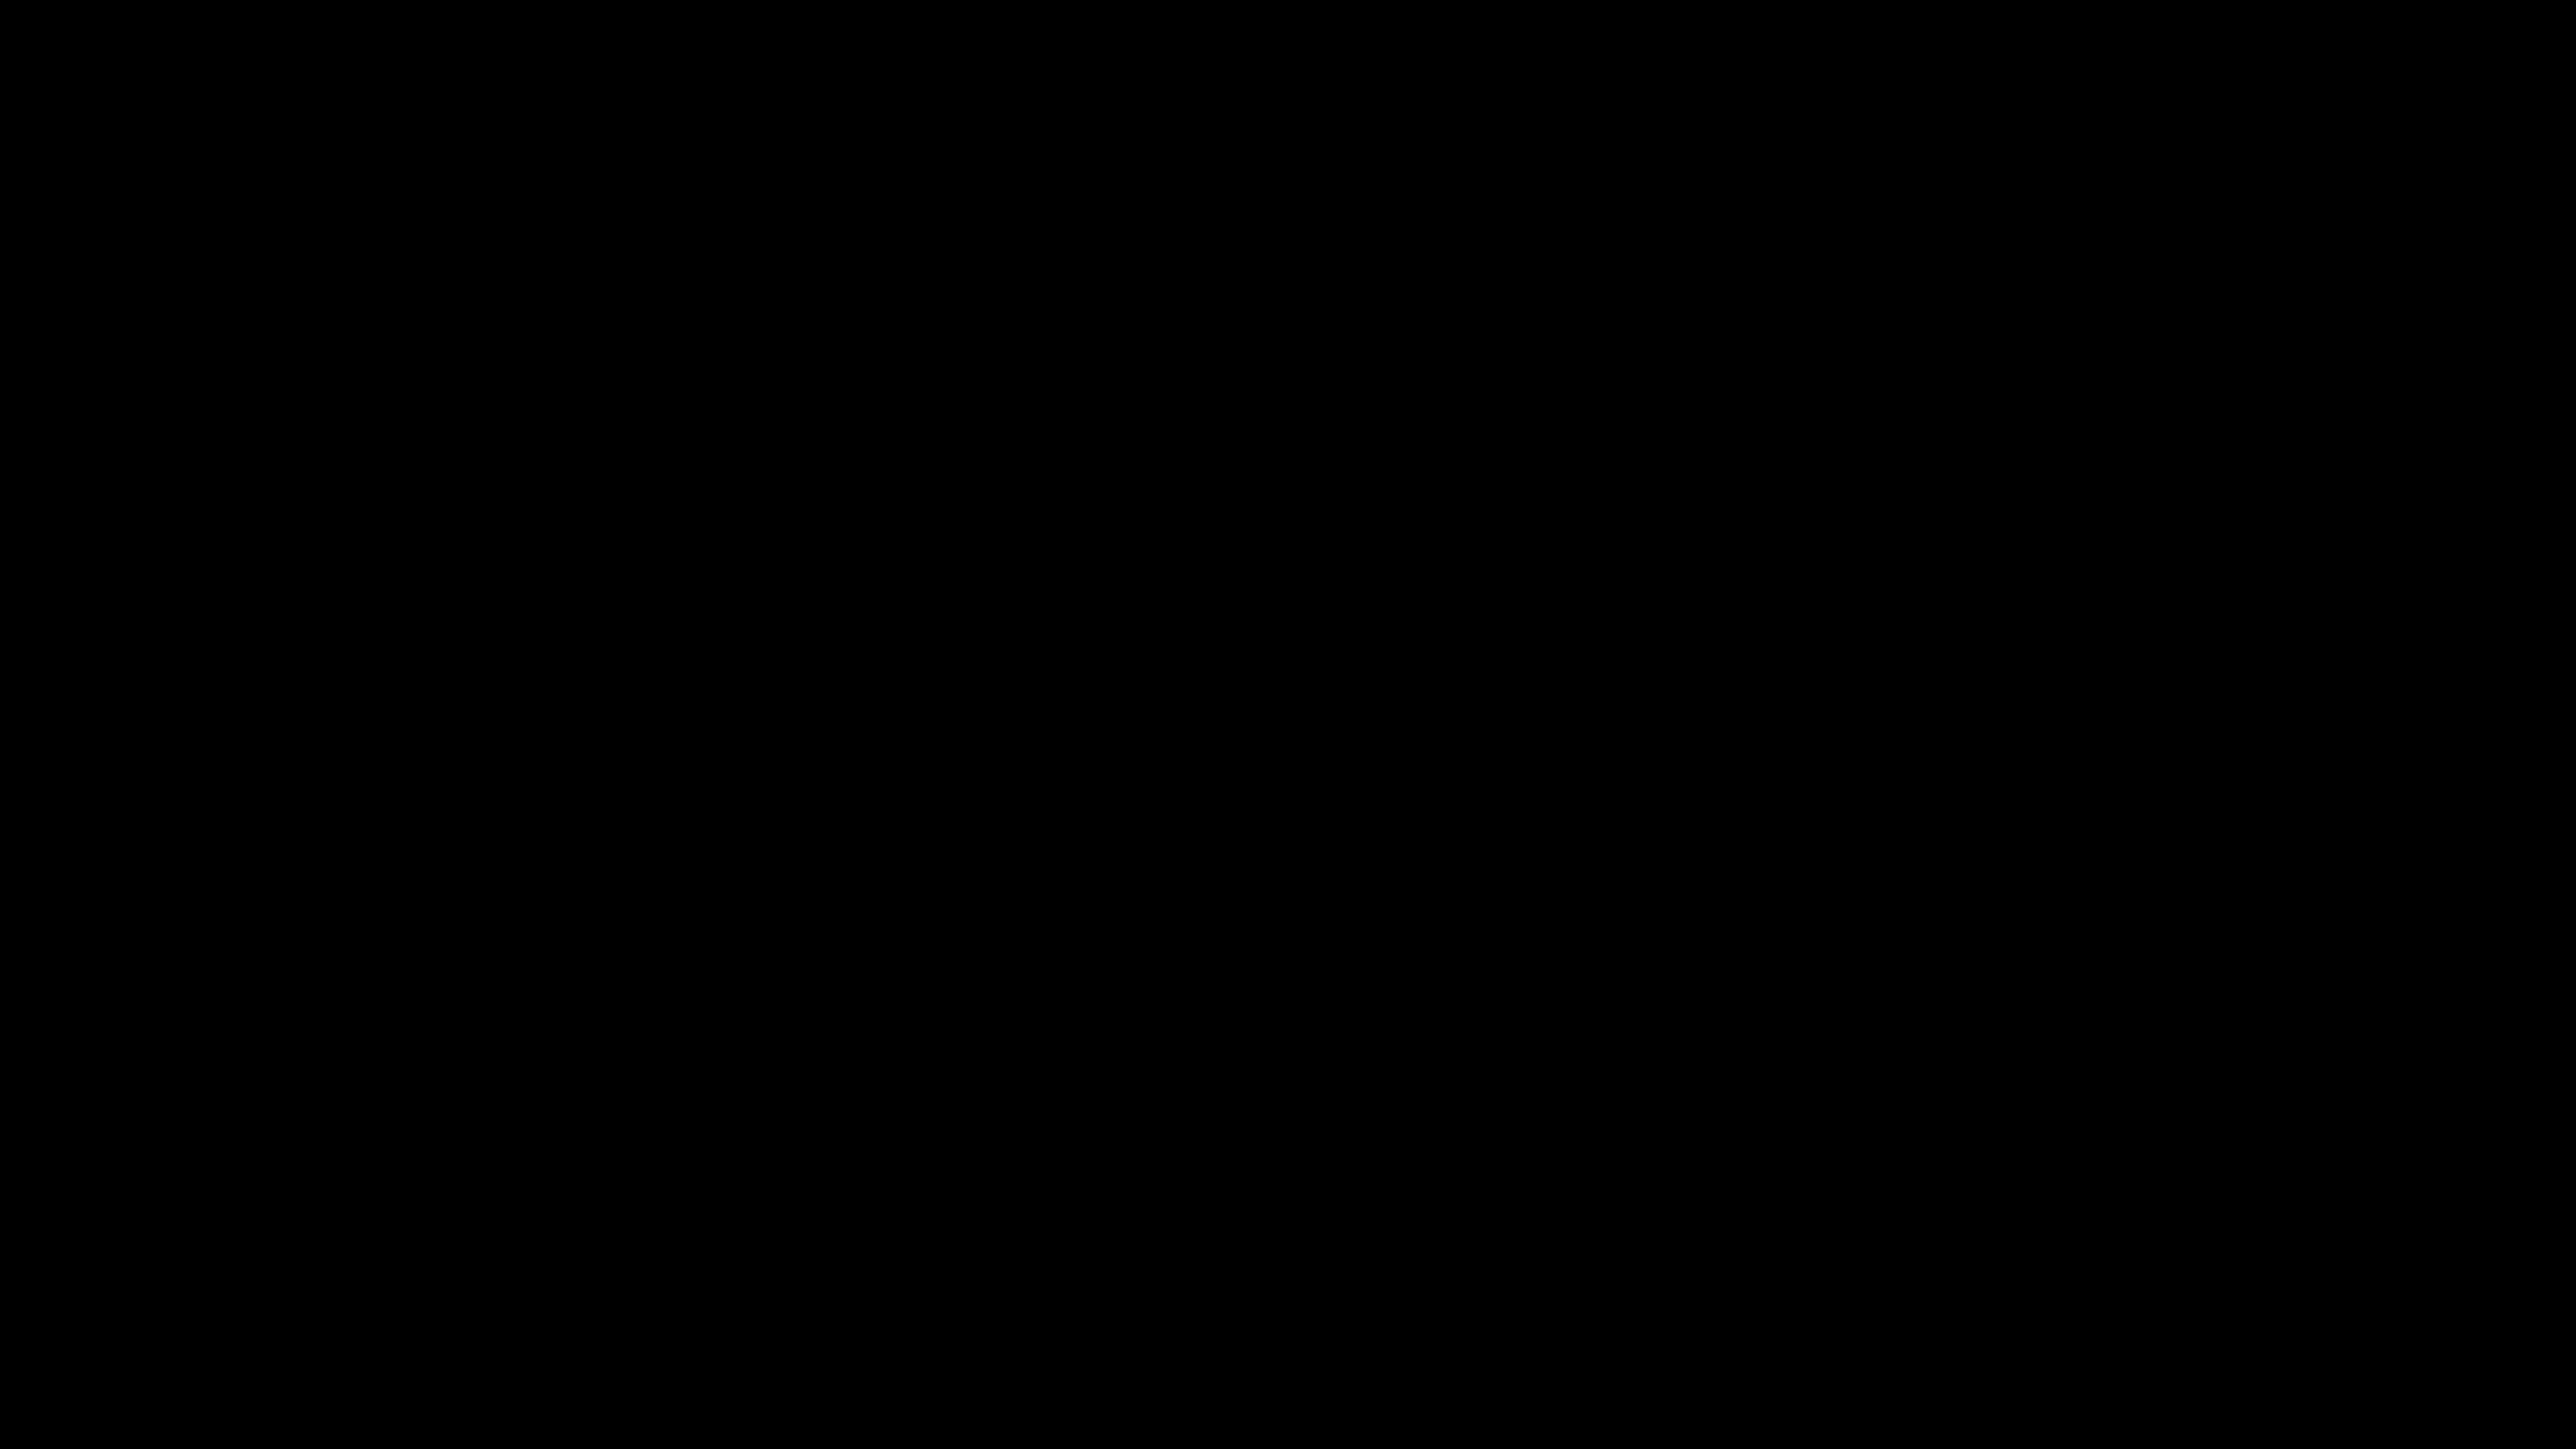 20190221_142502